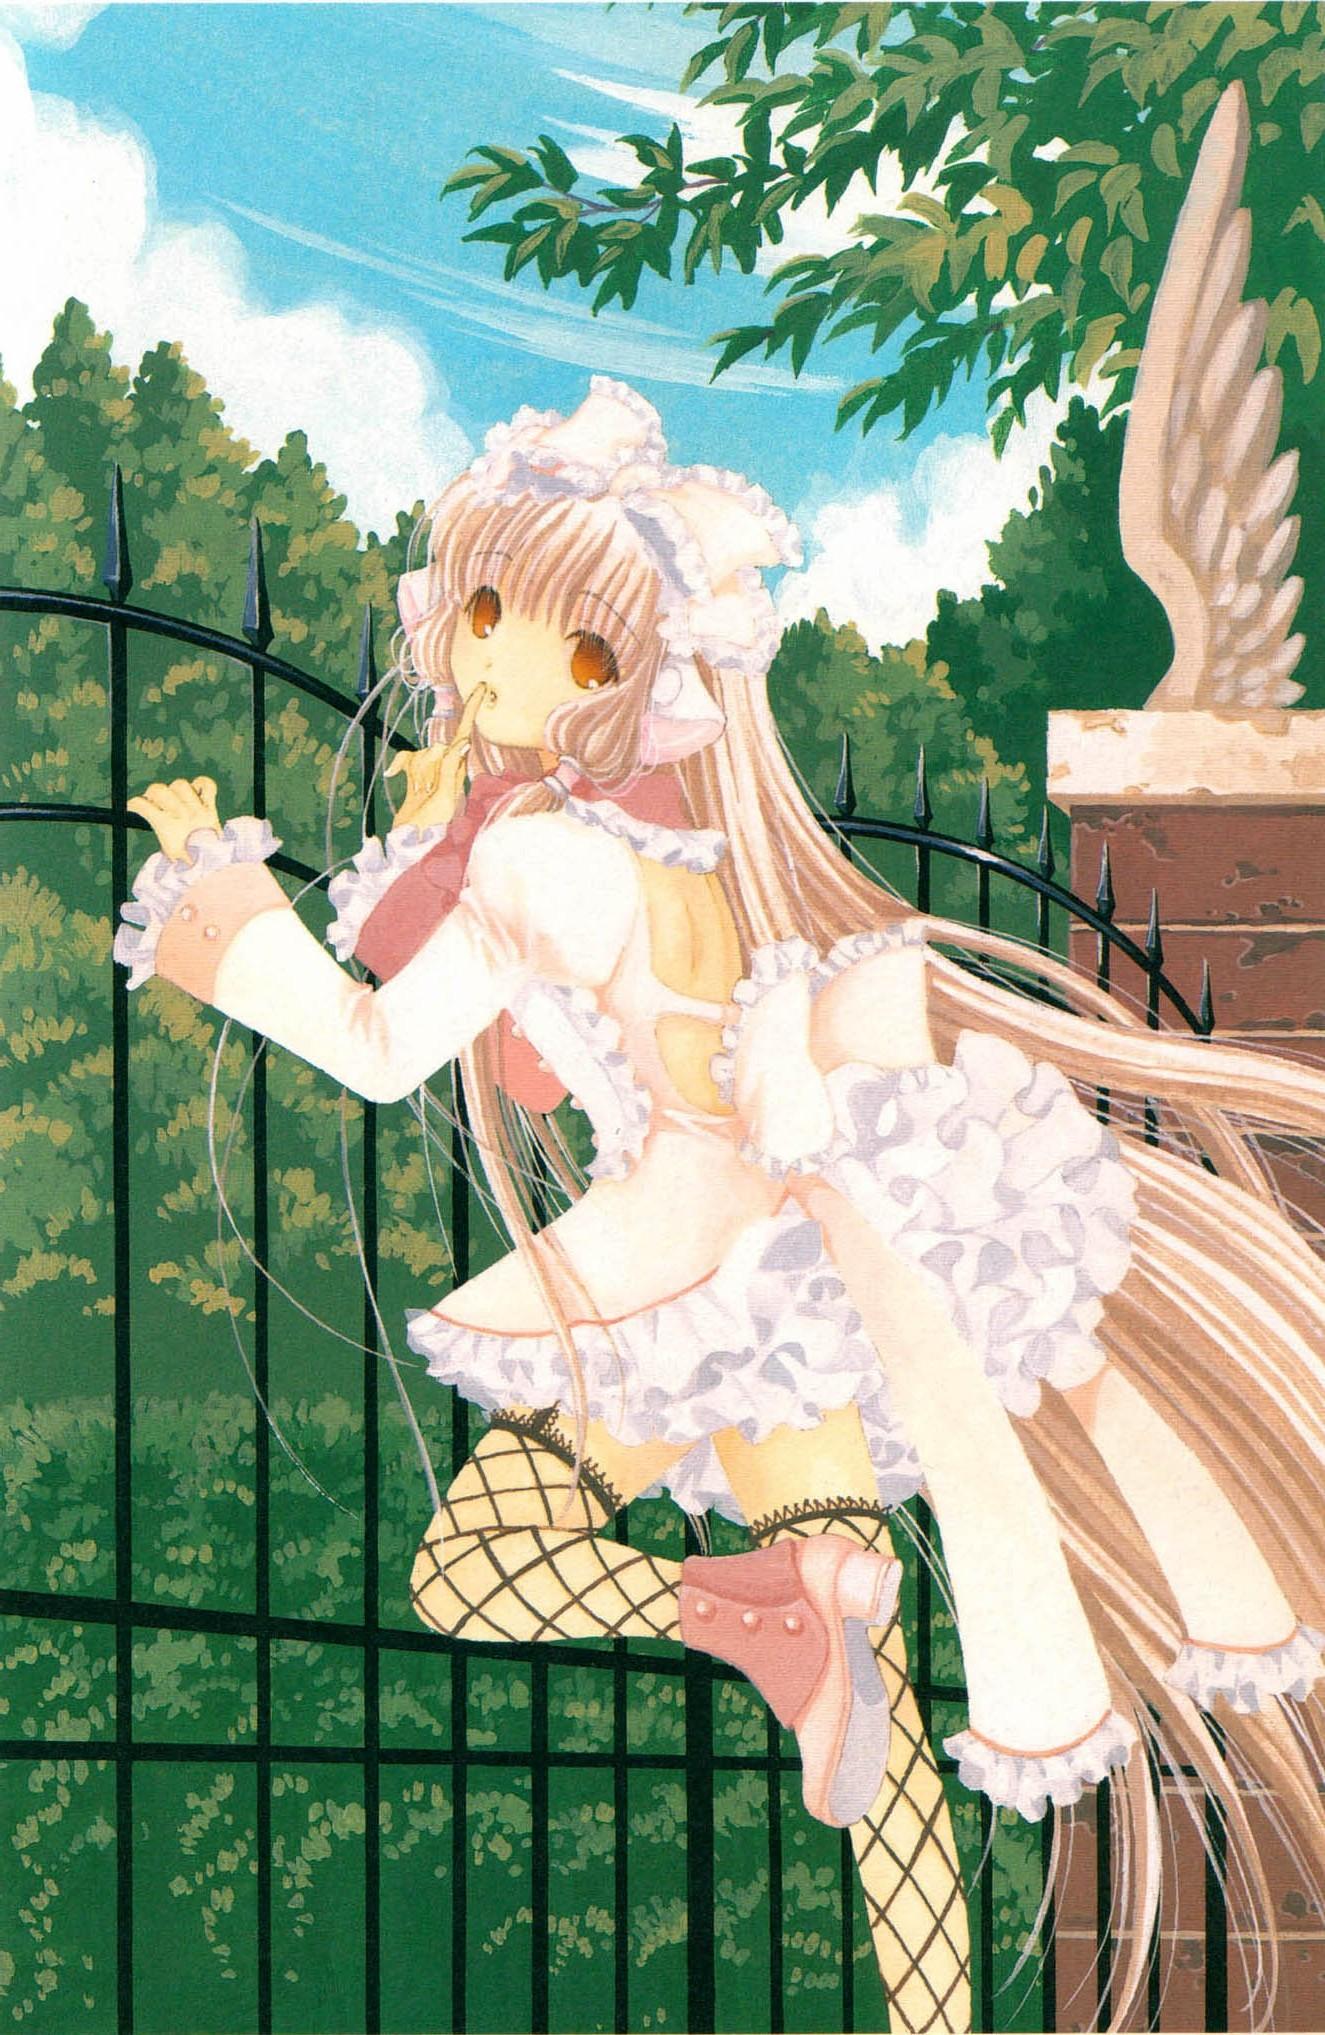 Wallpaper 1325x2035 Px Anime Chobits 1325x2035